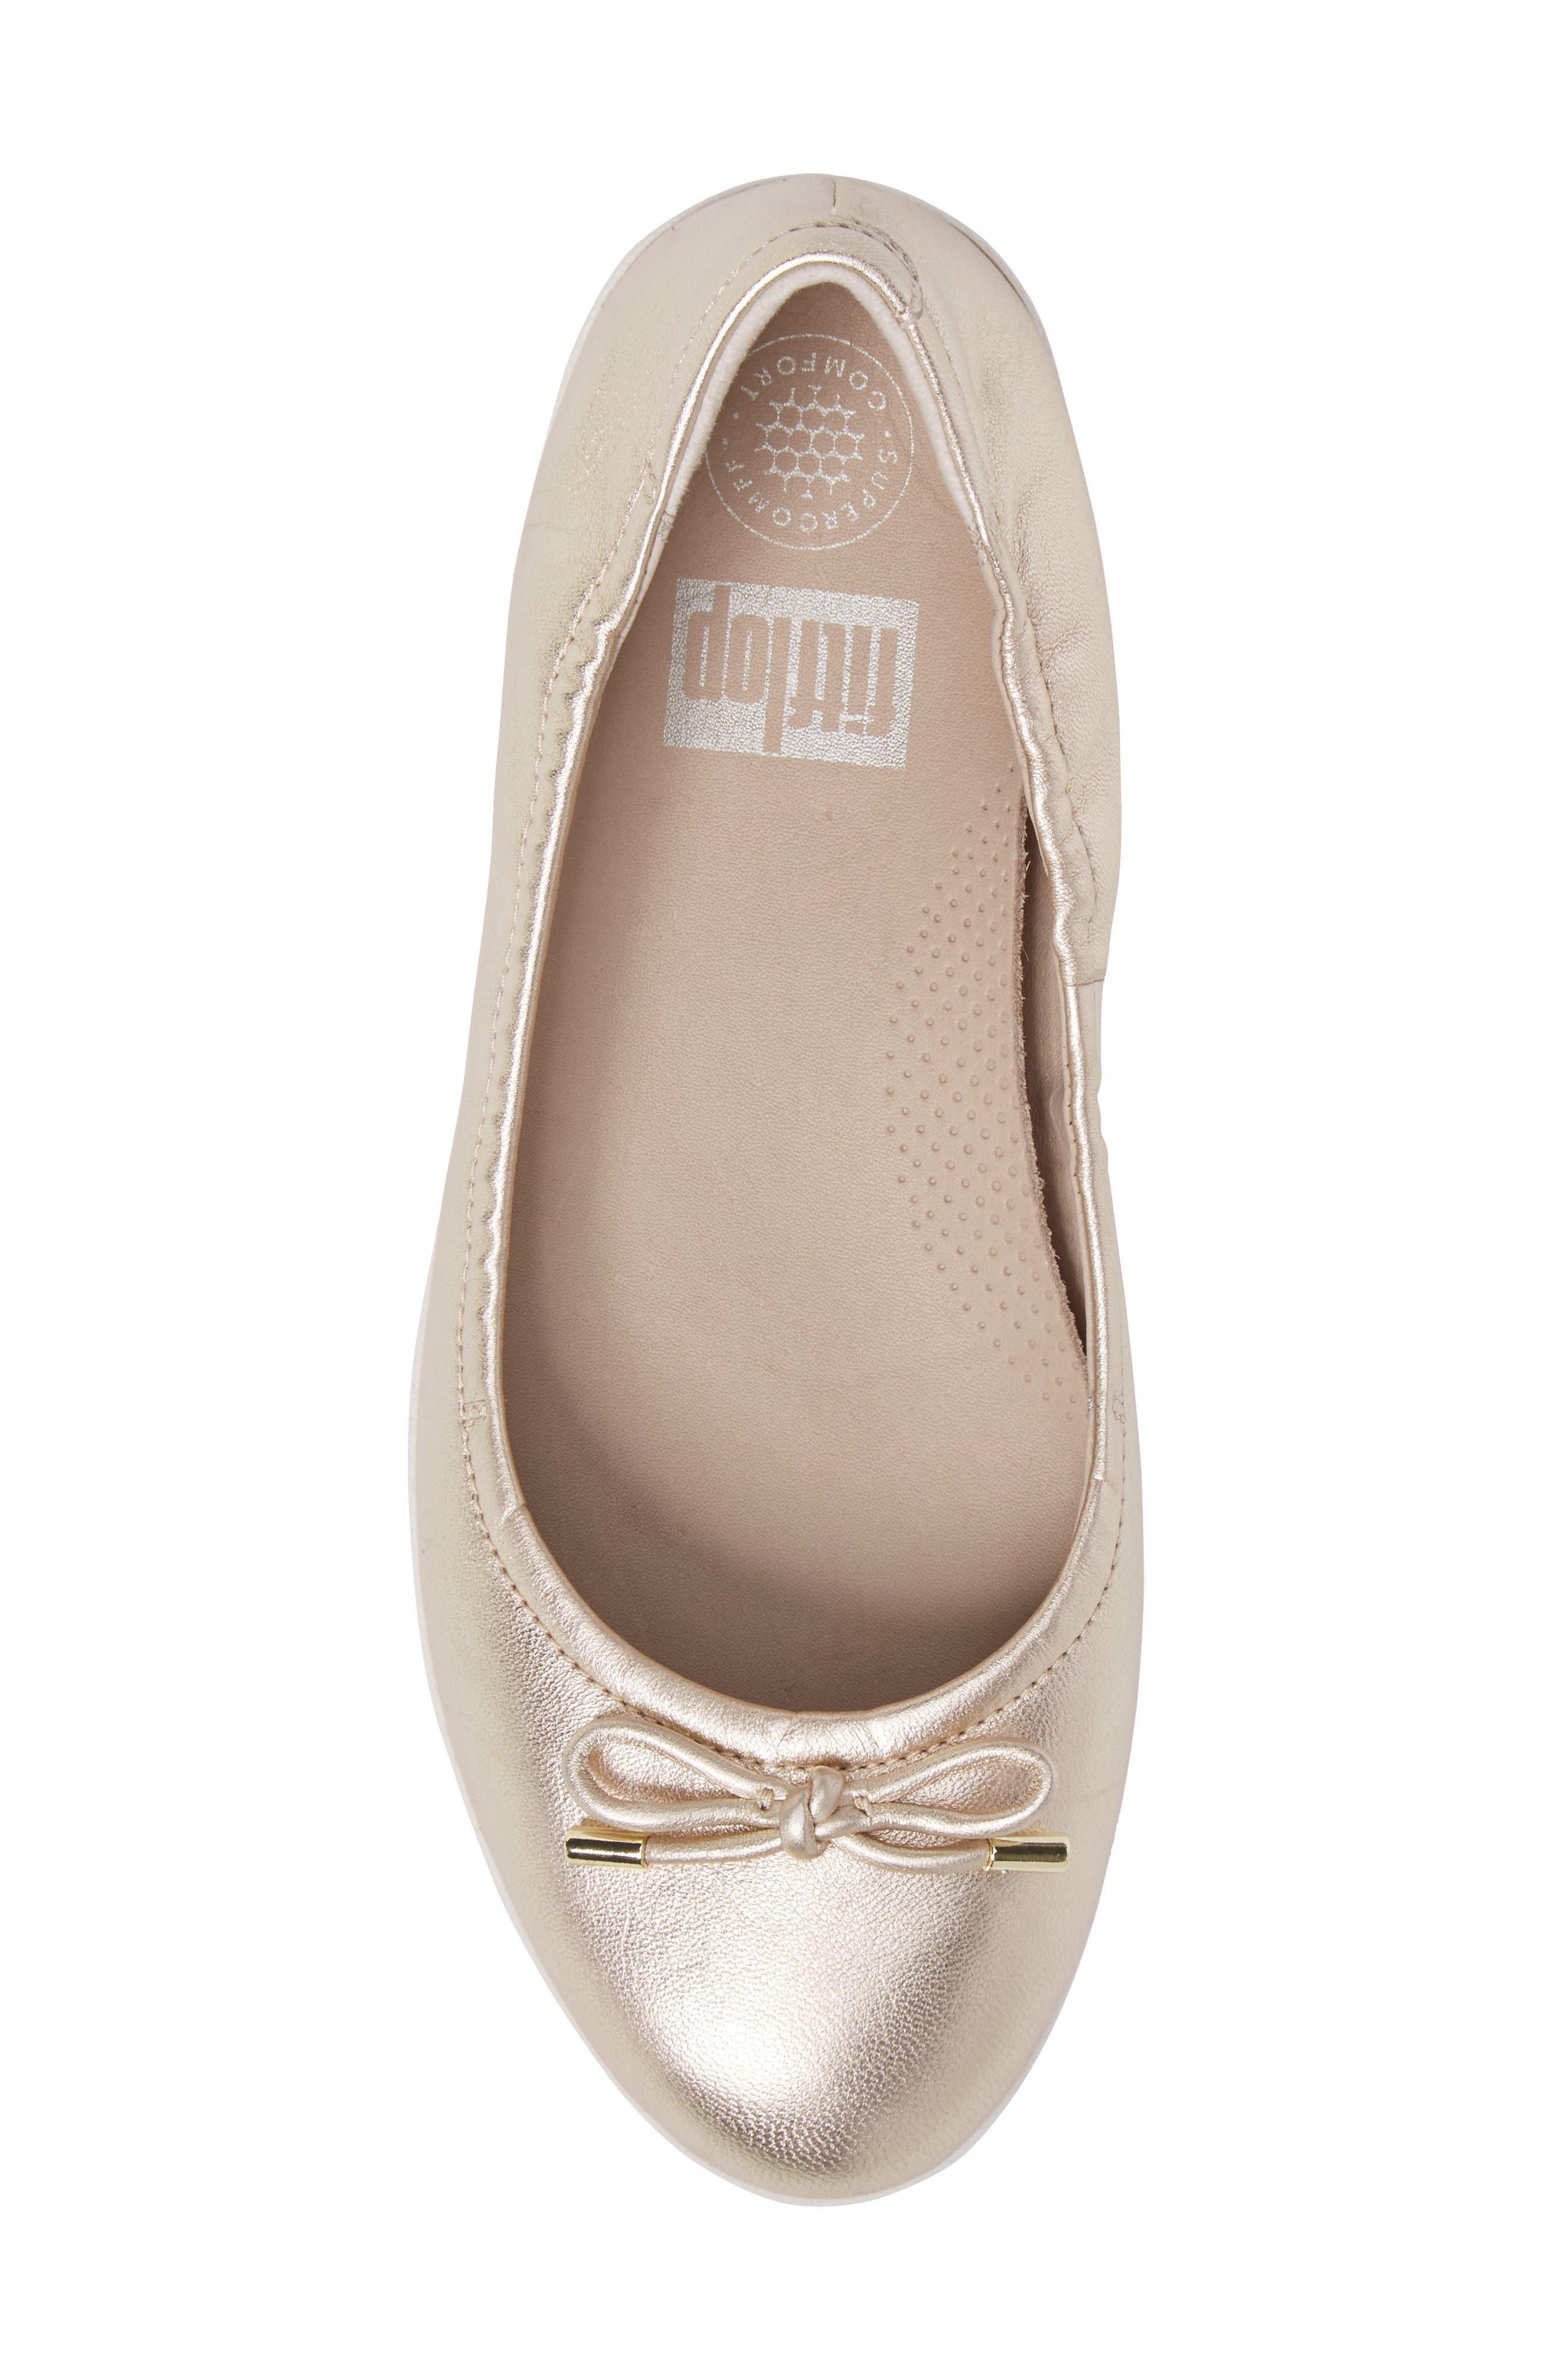 Superbendy Ballerina Flat,                             Alternate thumbnail 14, color,